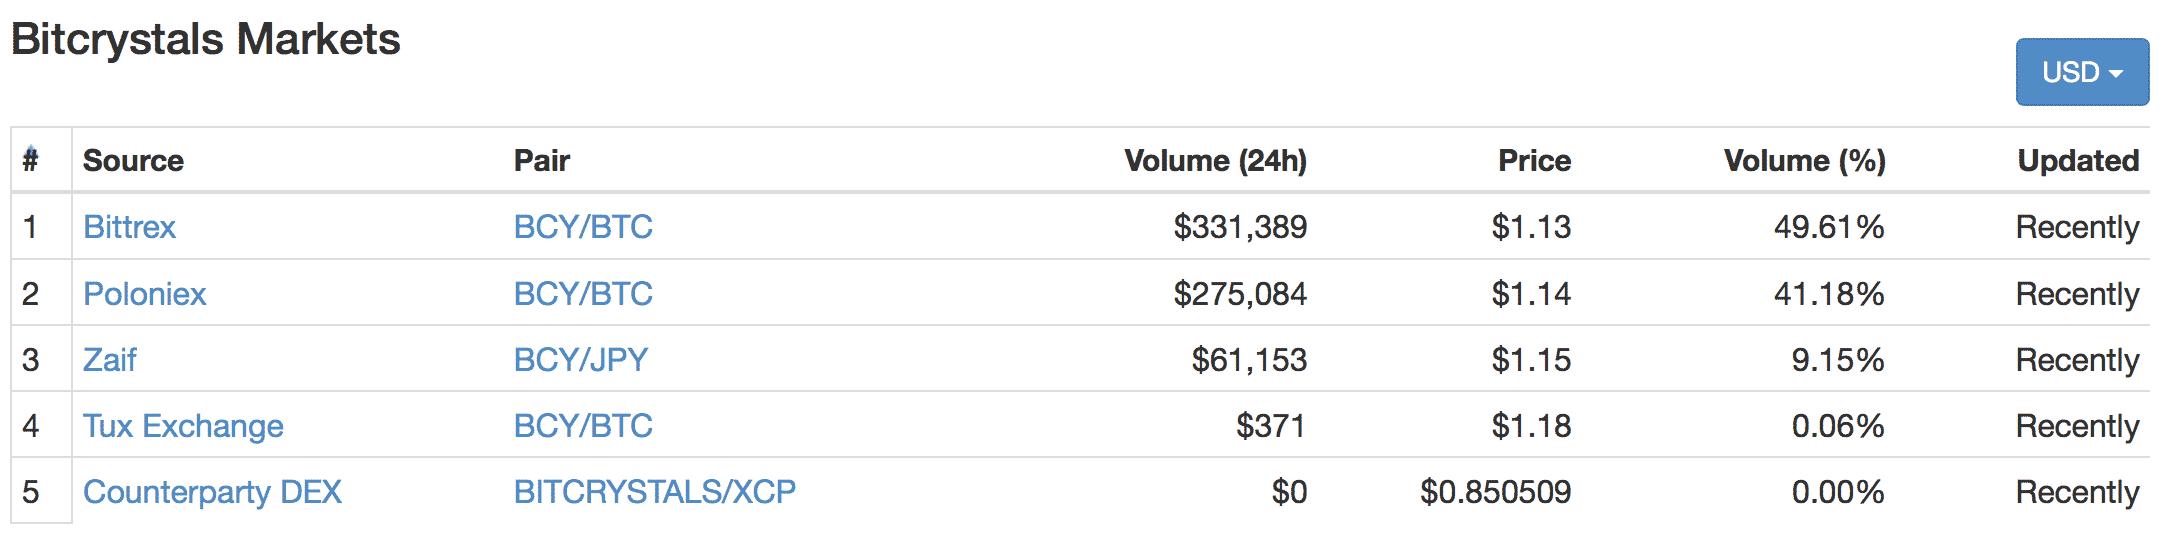 BitCrystals(ビットクリスタルズ)とは 仮想通貨の特徴・価格・チャート・取引所2